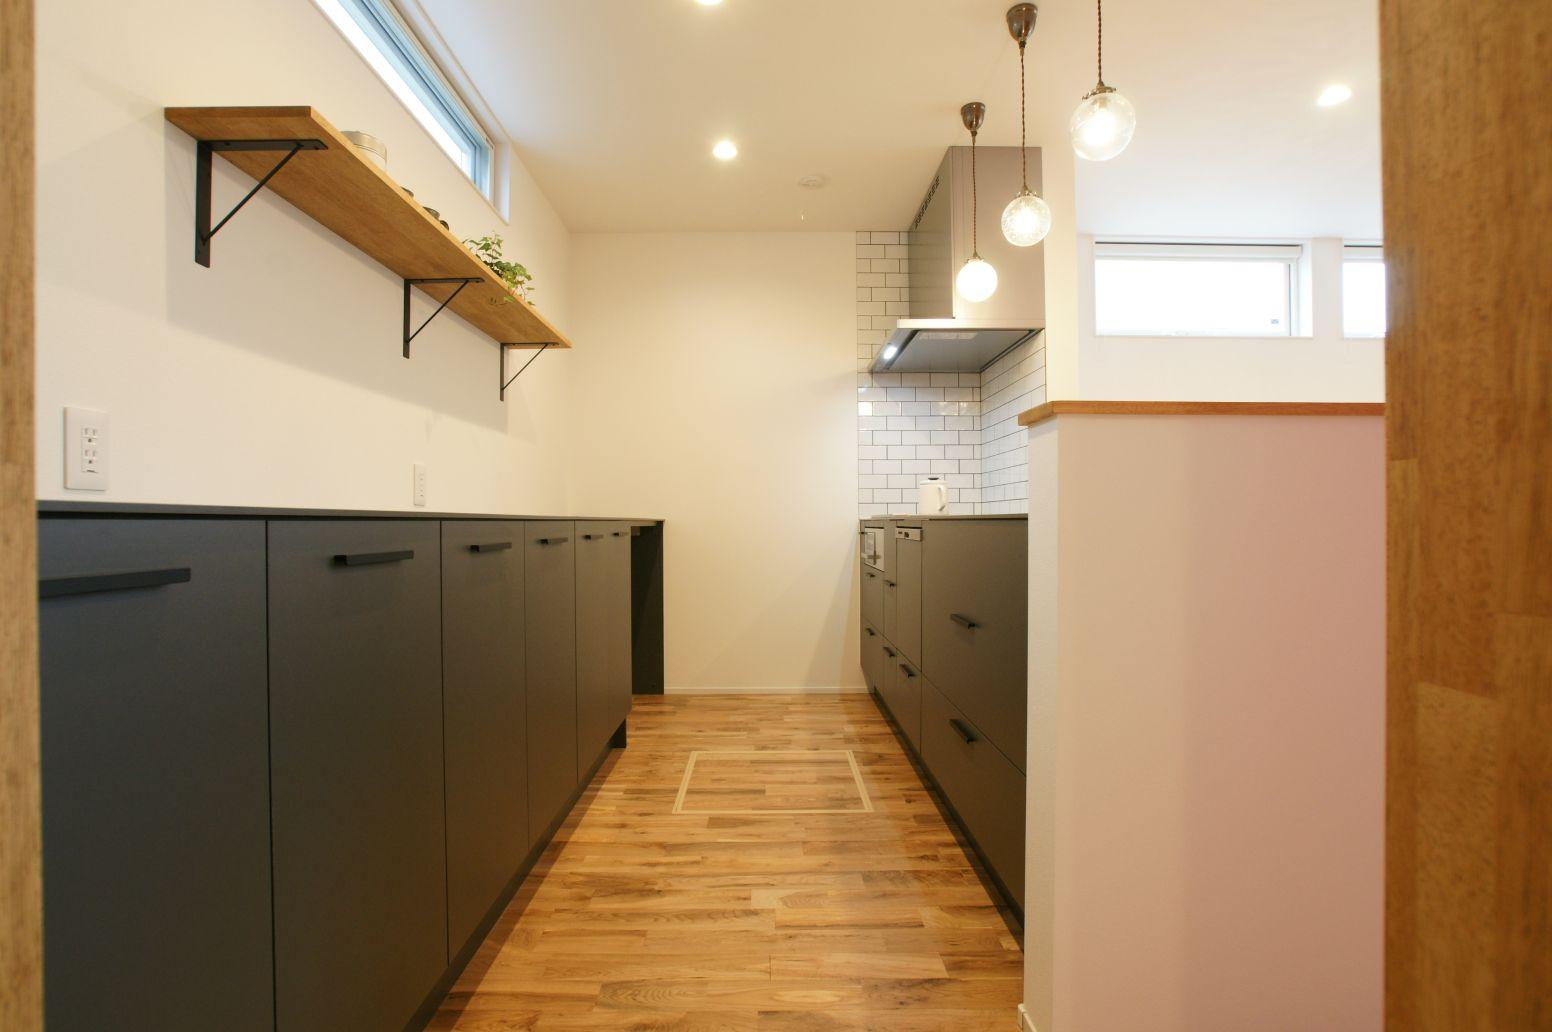 RIKYU (リキュー)【デザイン住宅、間取り、インテリア】使い勝手の良いキッチン